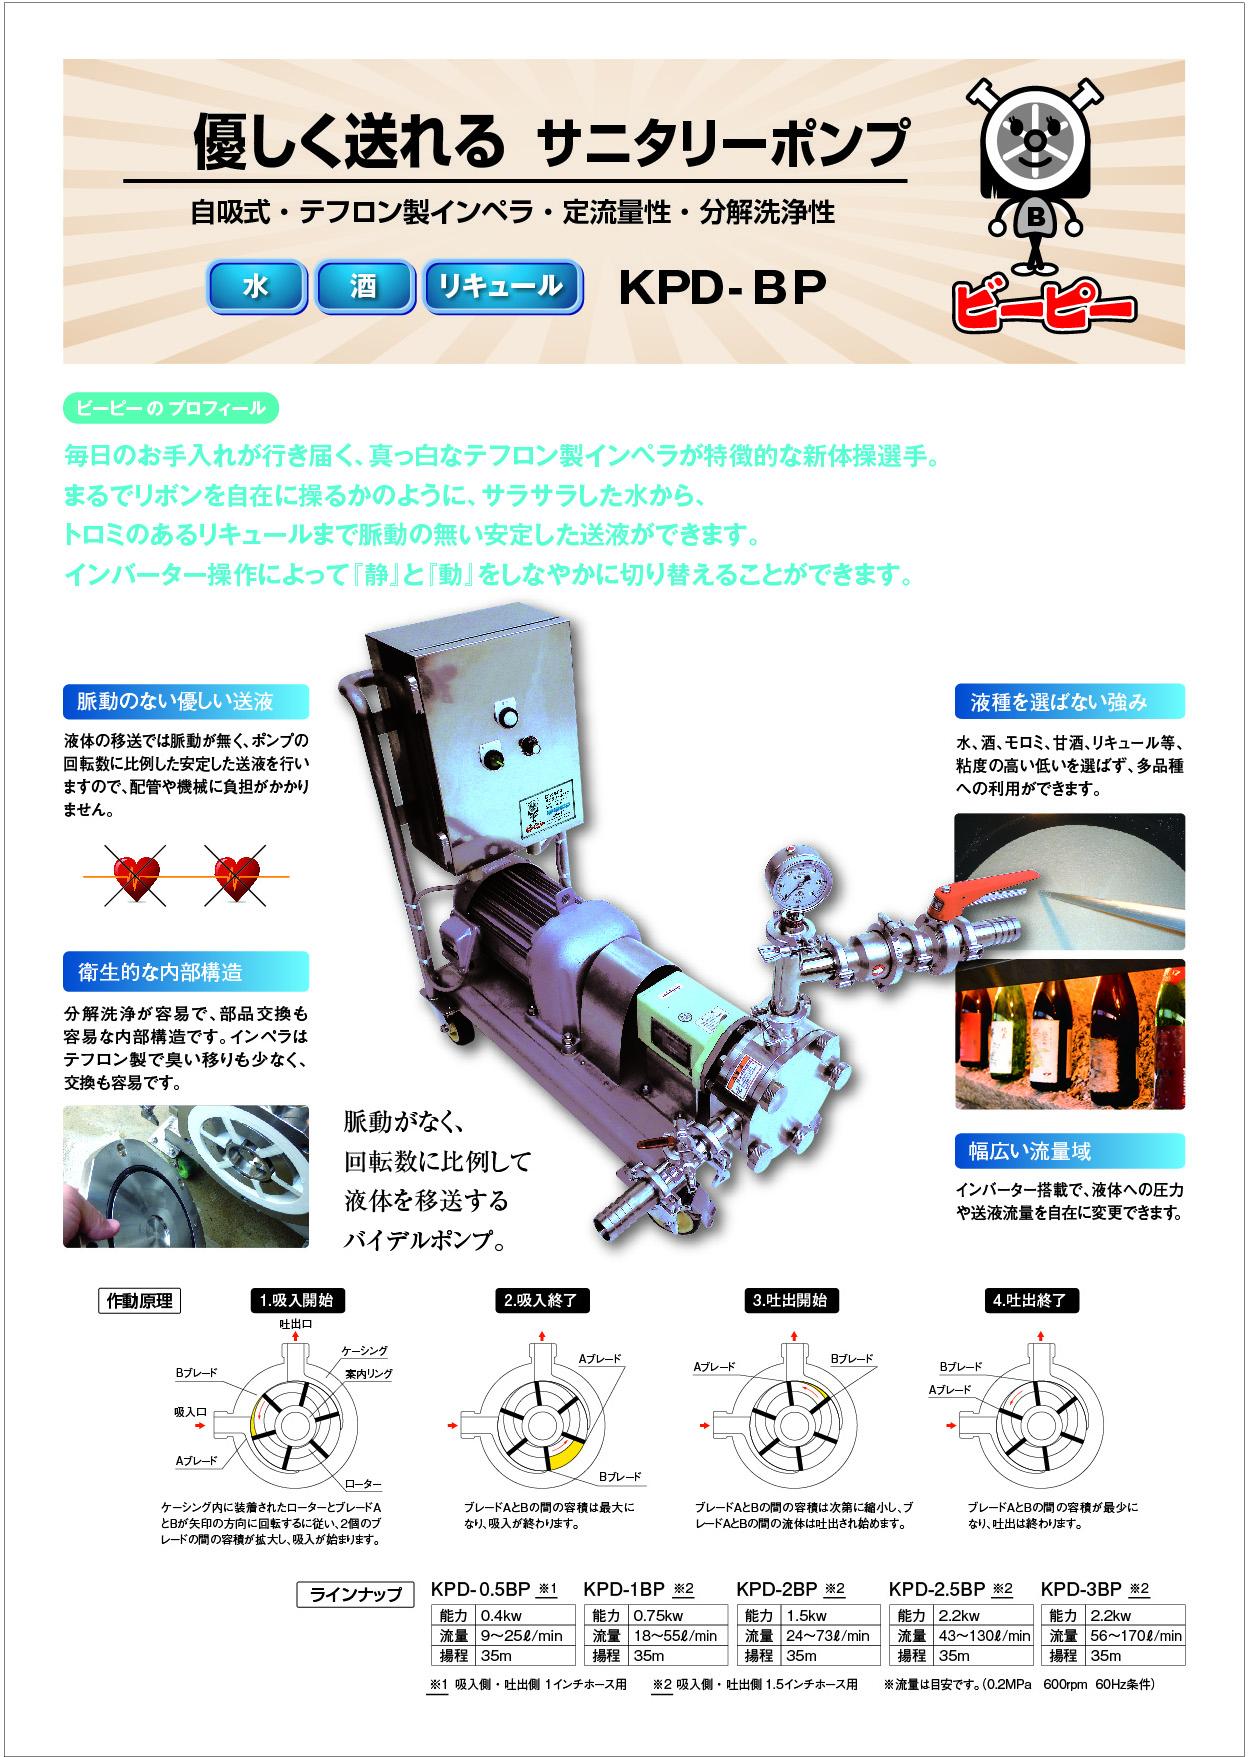 KPD-BP